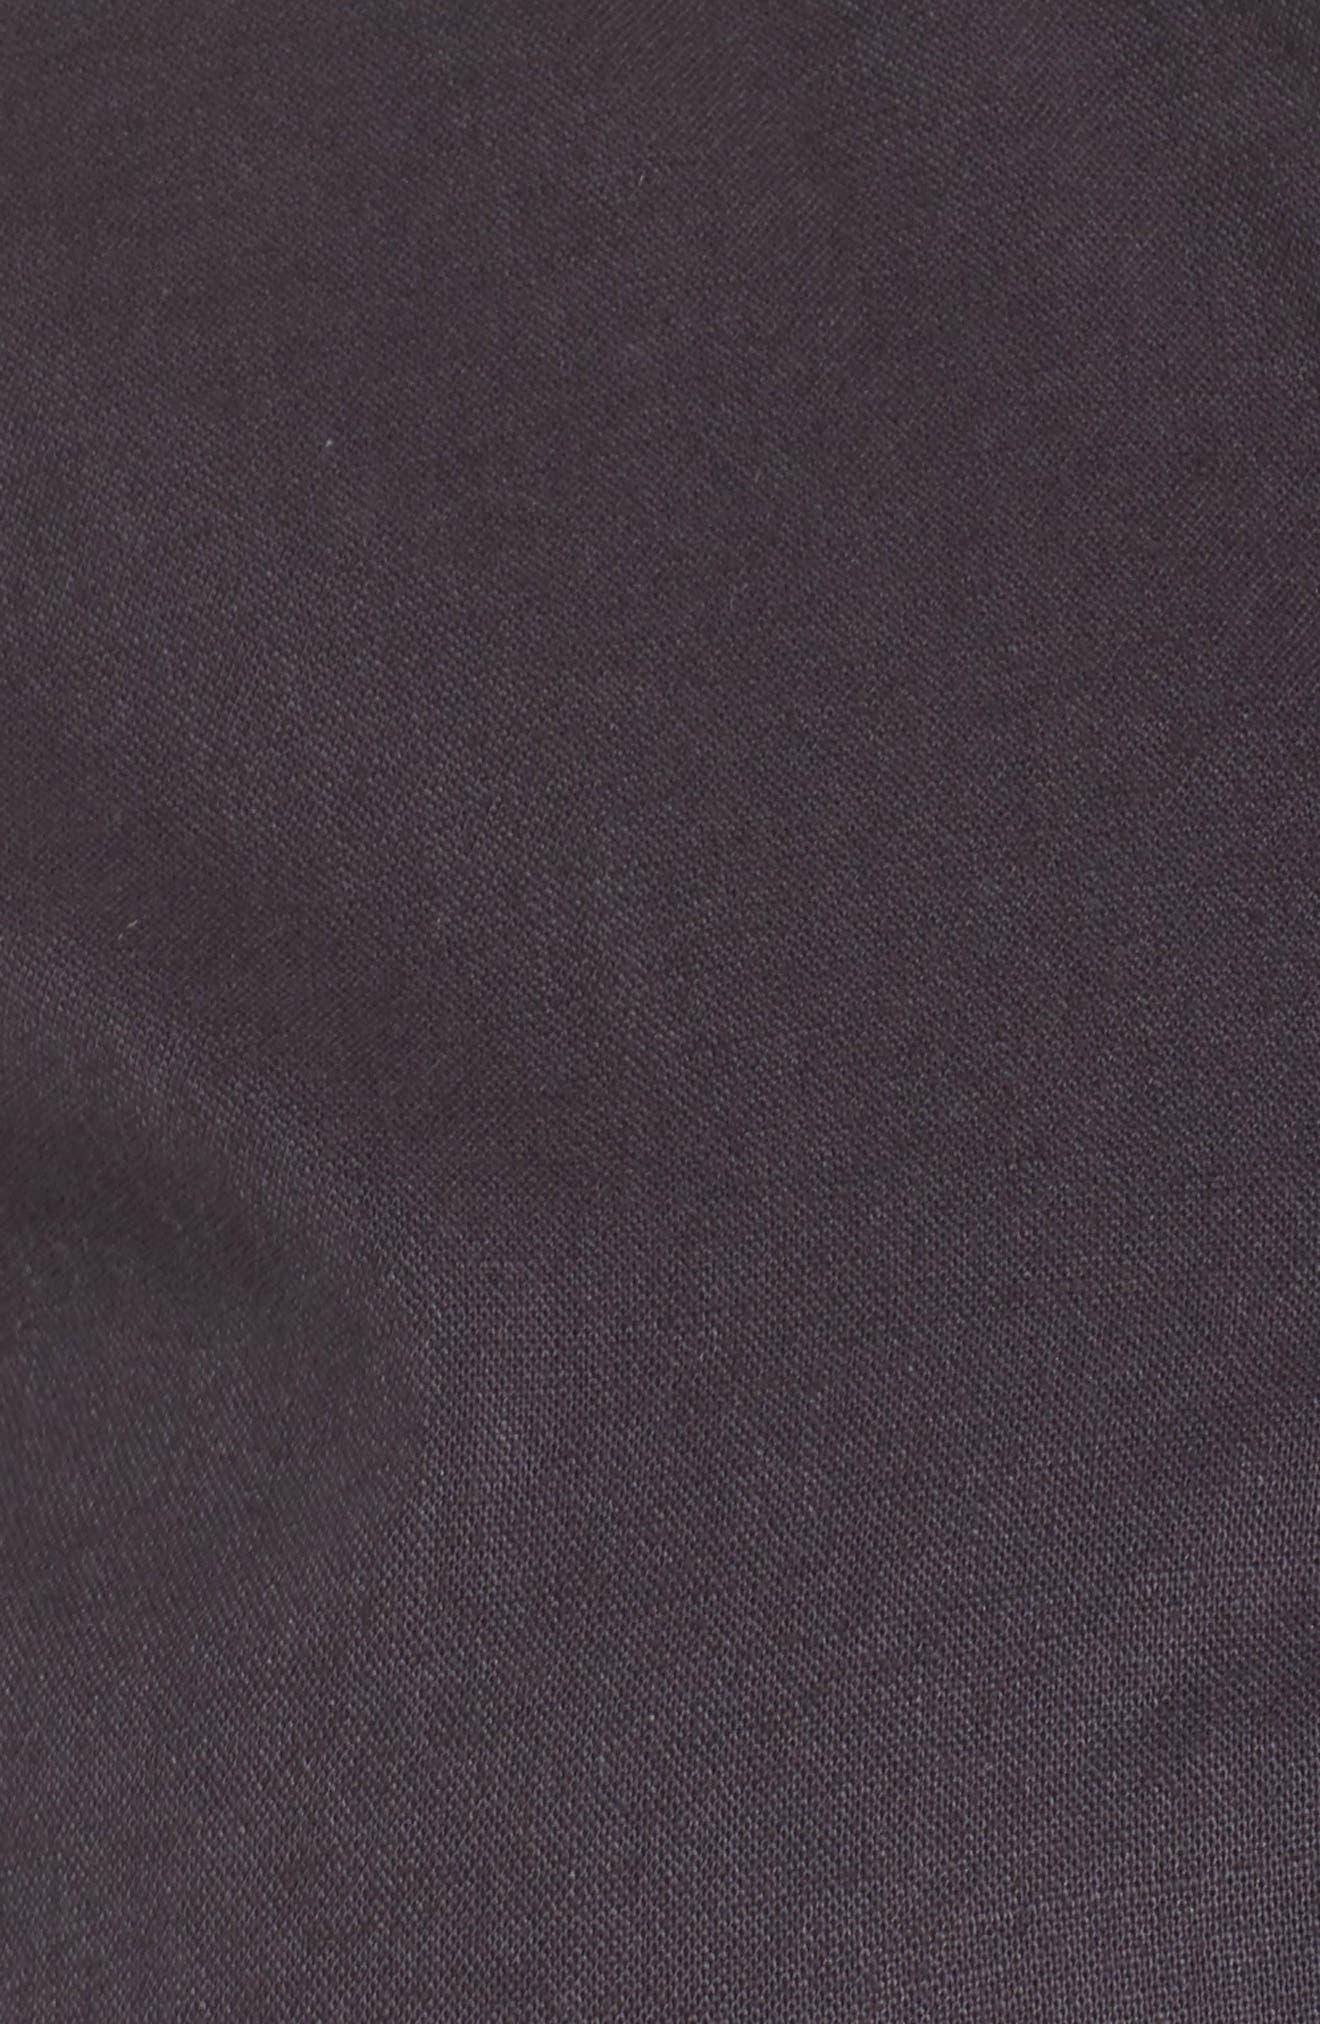 Tie Sleeve Utility Jacket,                             Alternate thumbnail 6, color,                             Grey Ebony